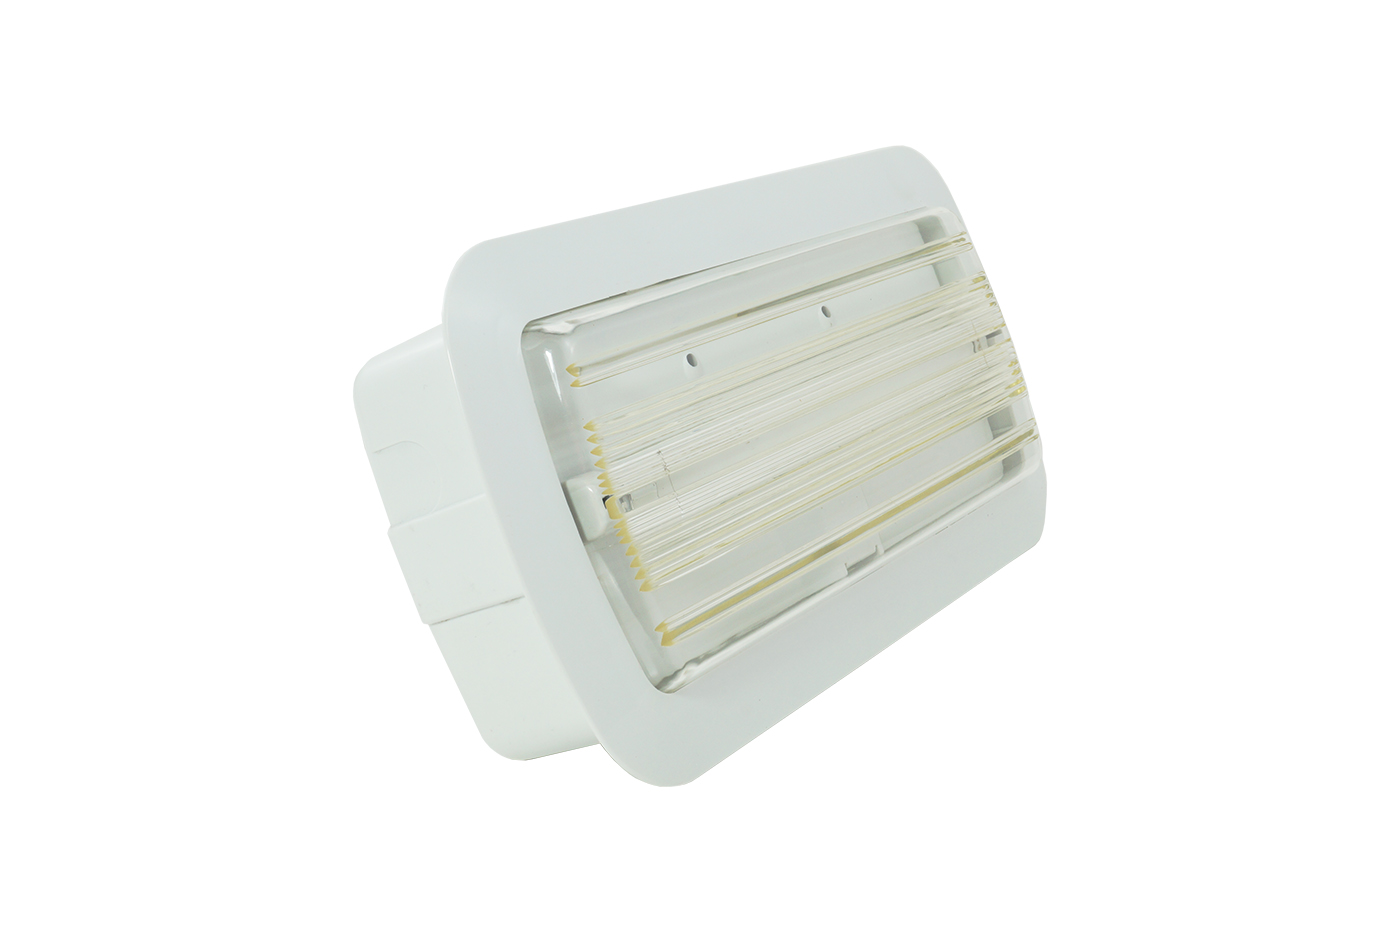 Plafoniera Con Lampada Di Emergenza : Bes lampade emergenza beselettronica lampada